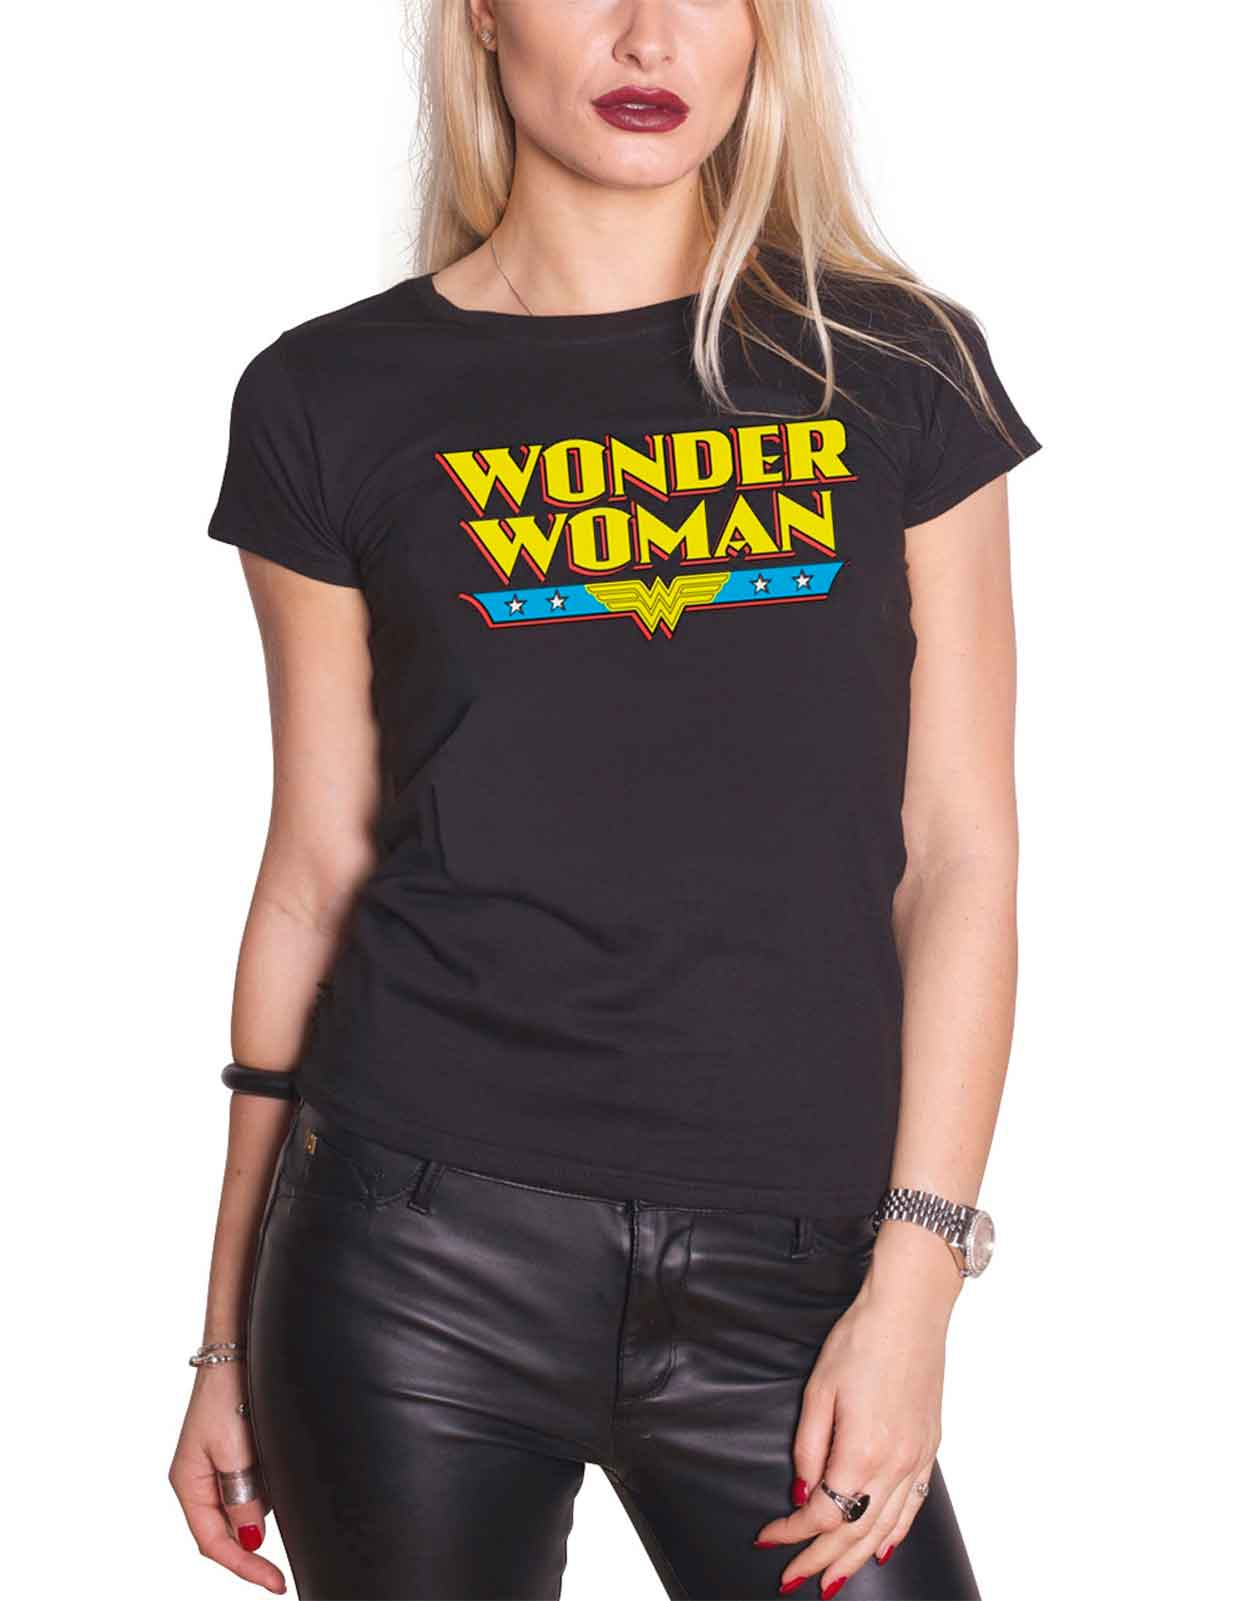 39aee812c9f2 Wonder Woman T Shirt WW Logo new Official DC Comics Womens Skinny Fit Black